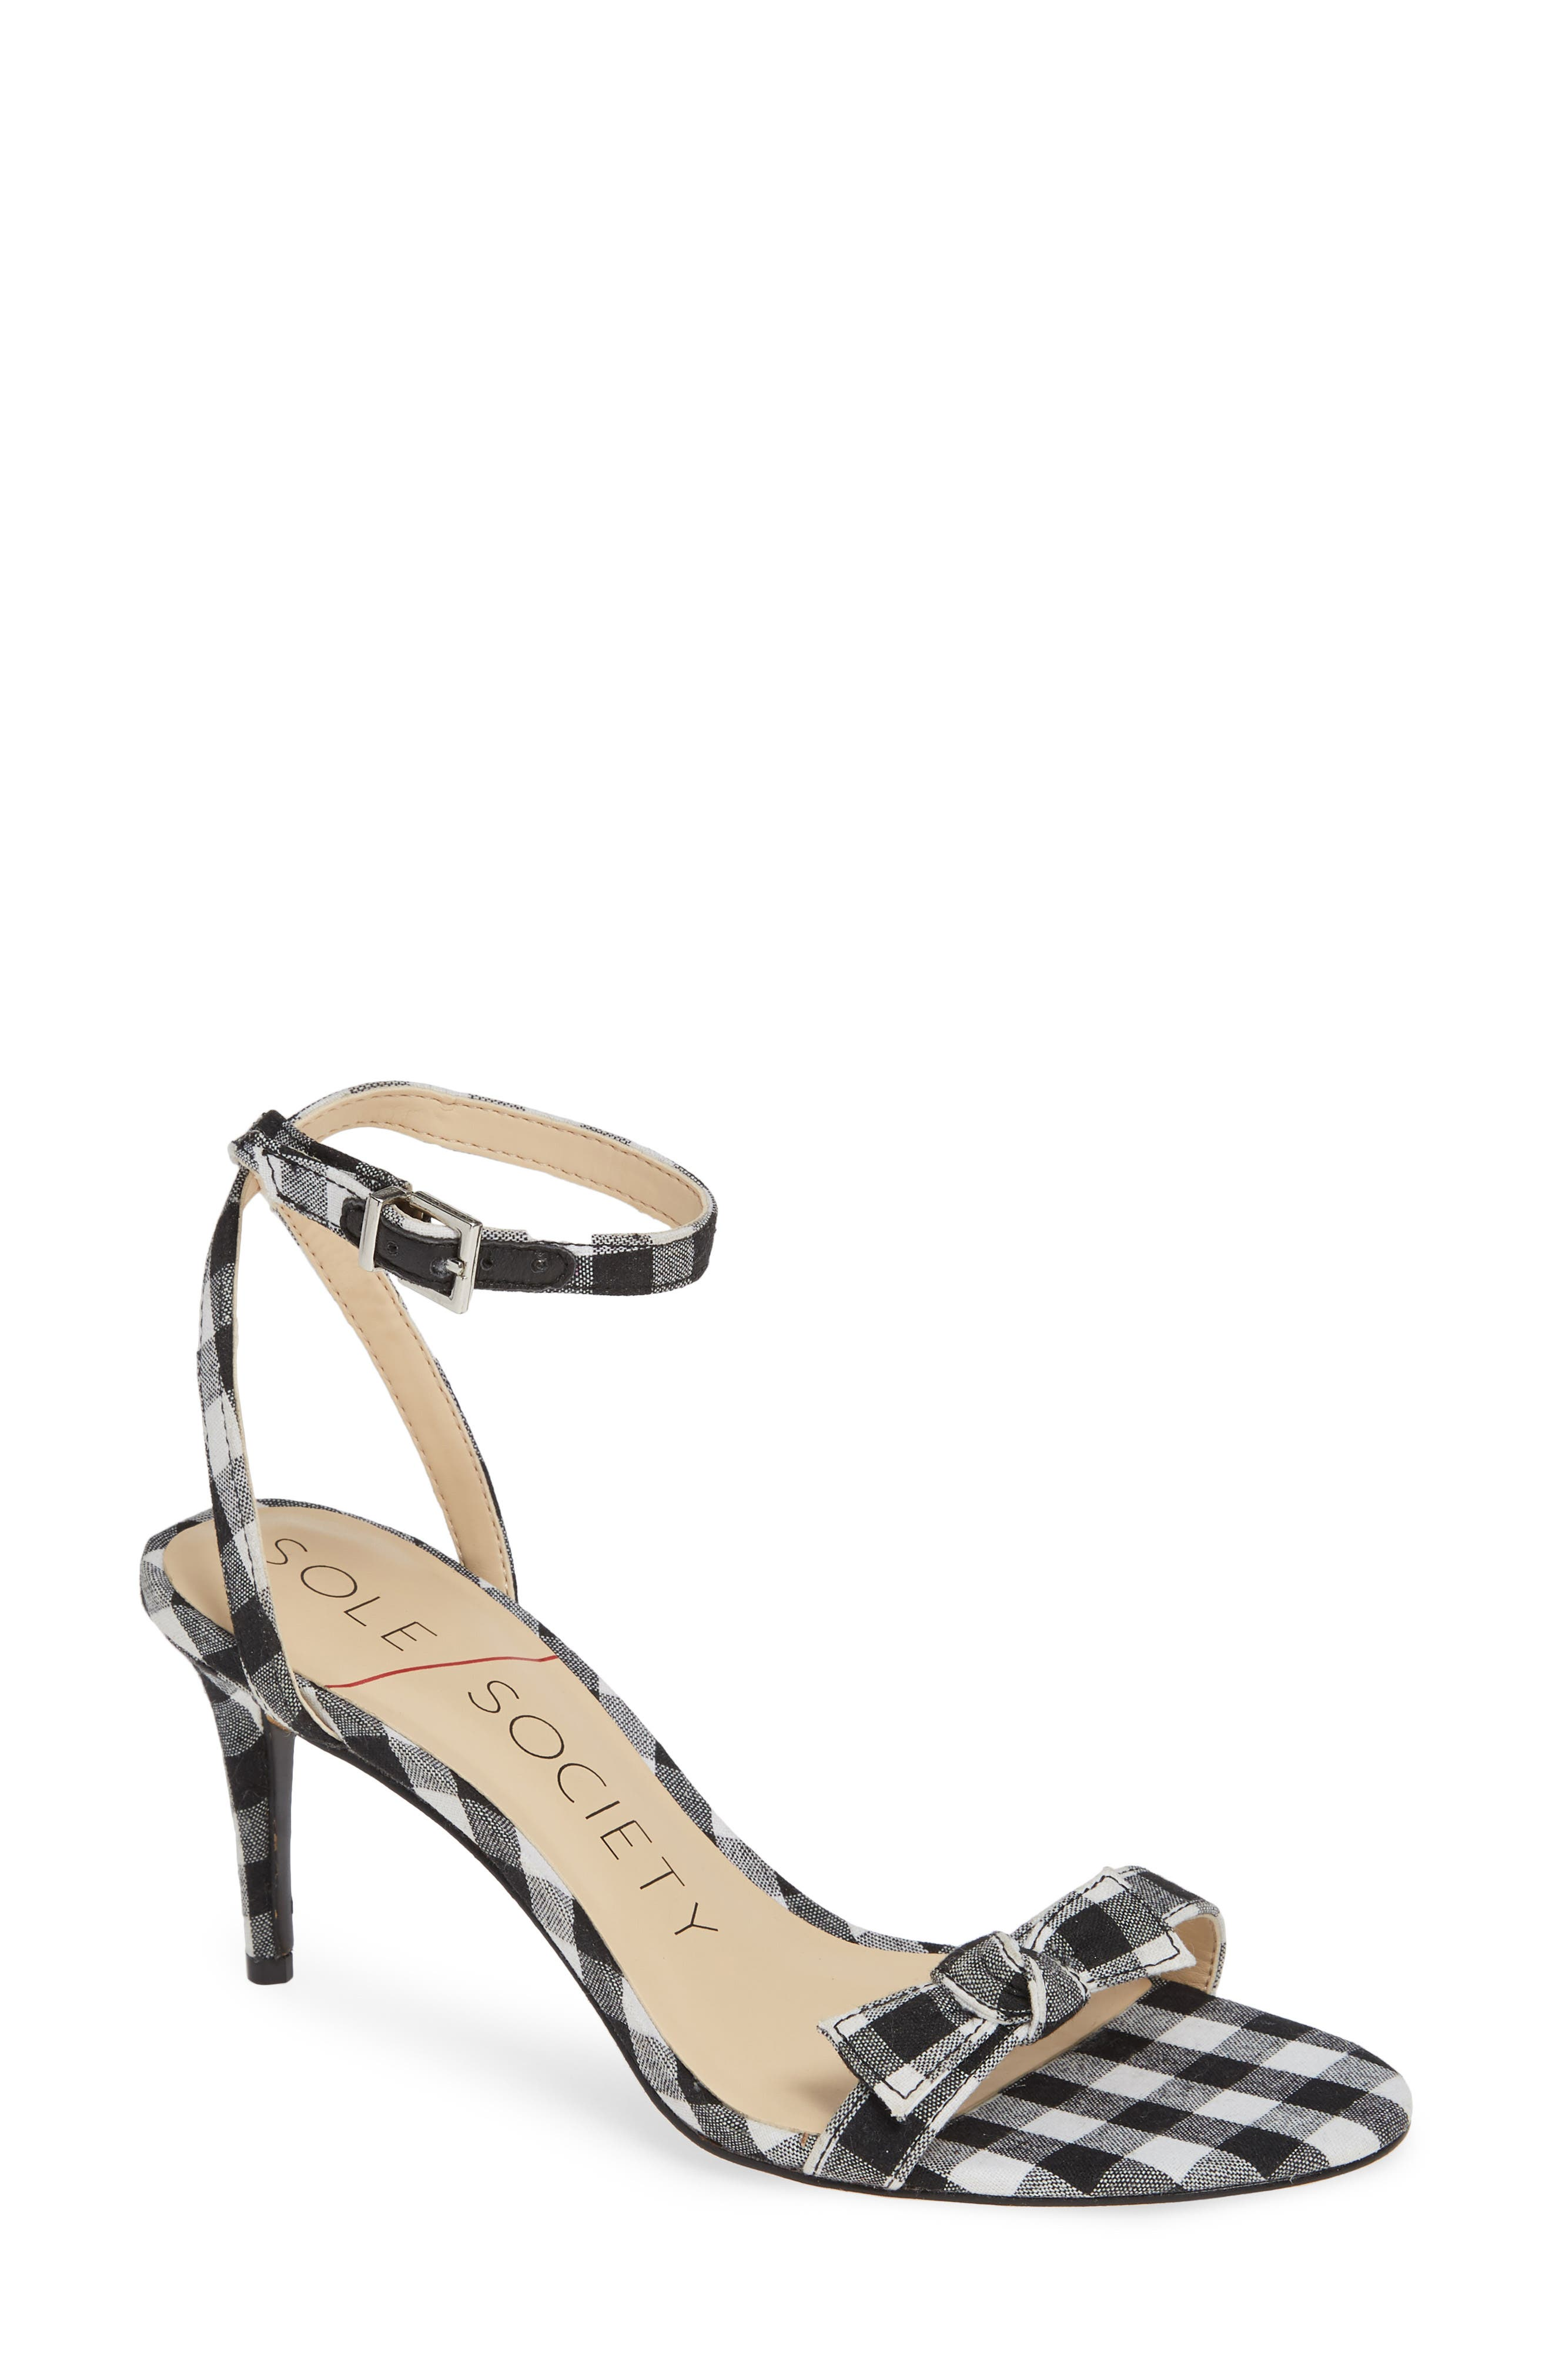 Avrilie Knotted Sandal,                         Main,                         color, BLACK/ WHITE GINGHAM